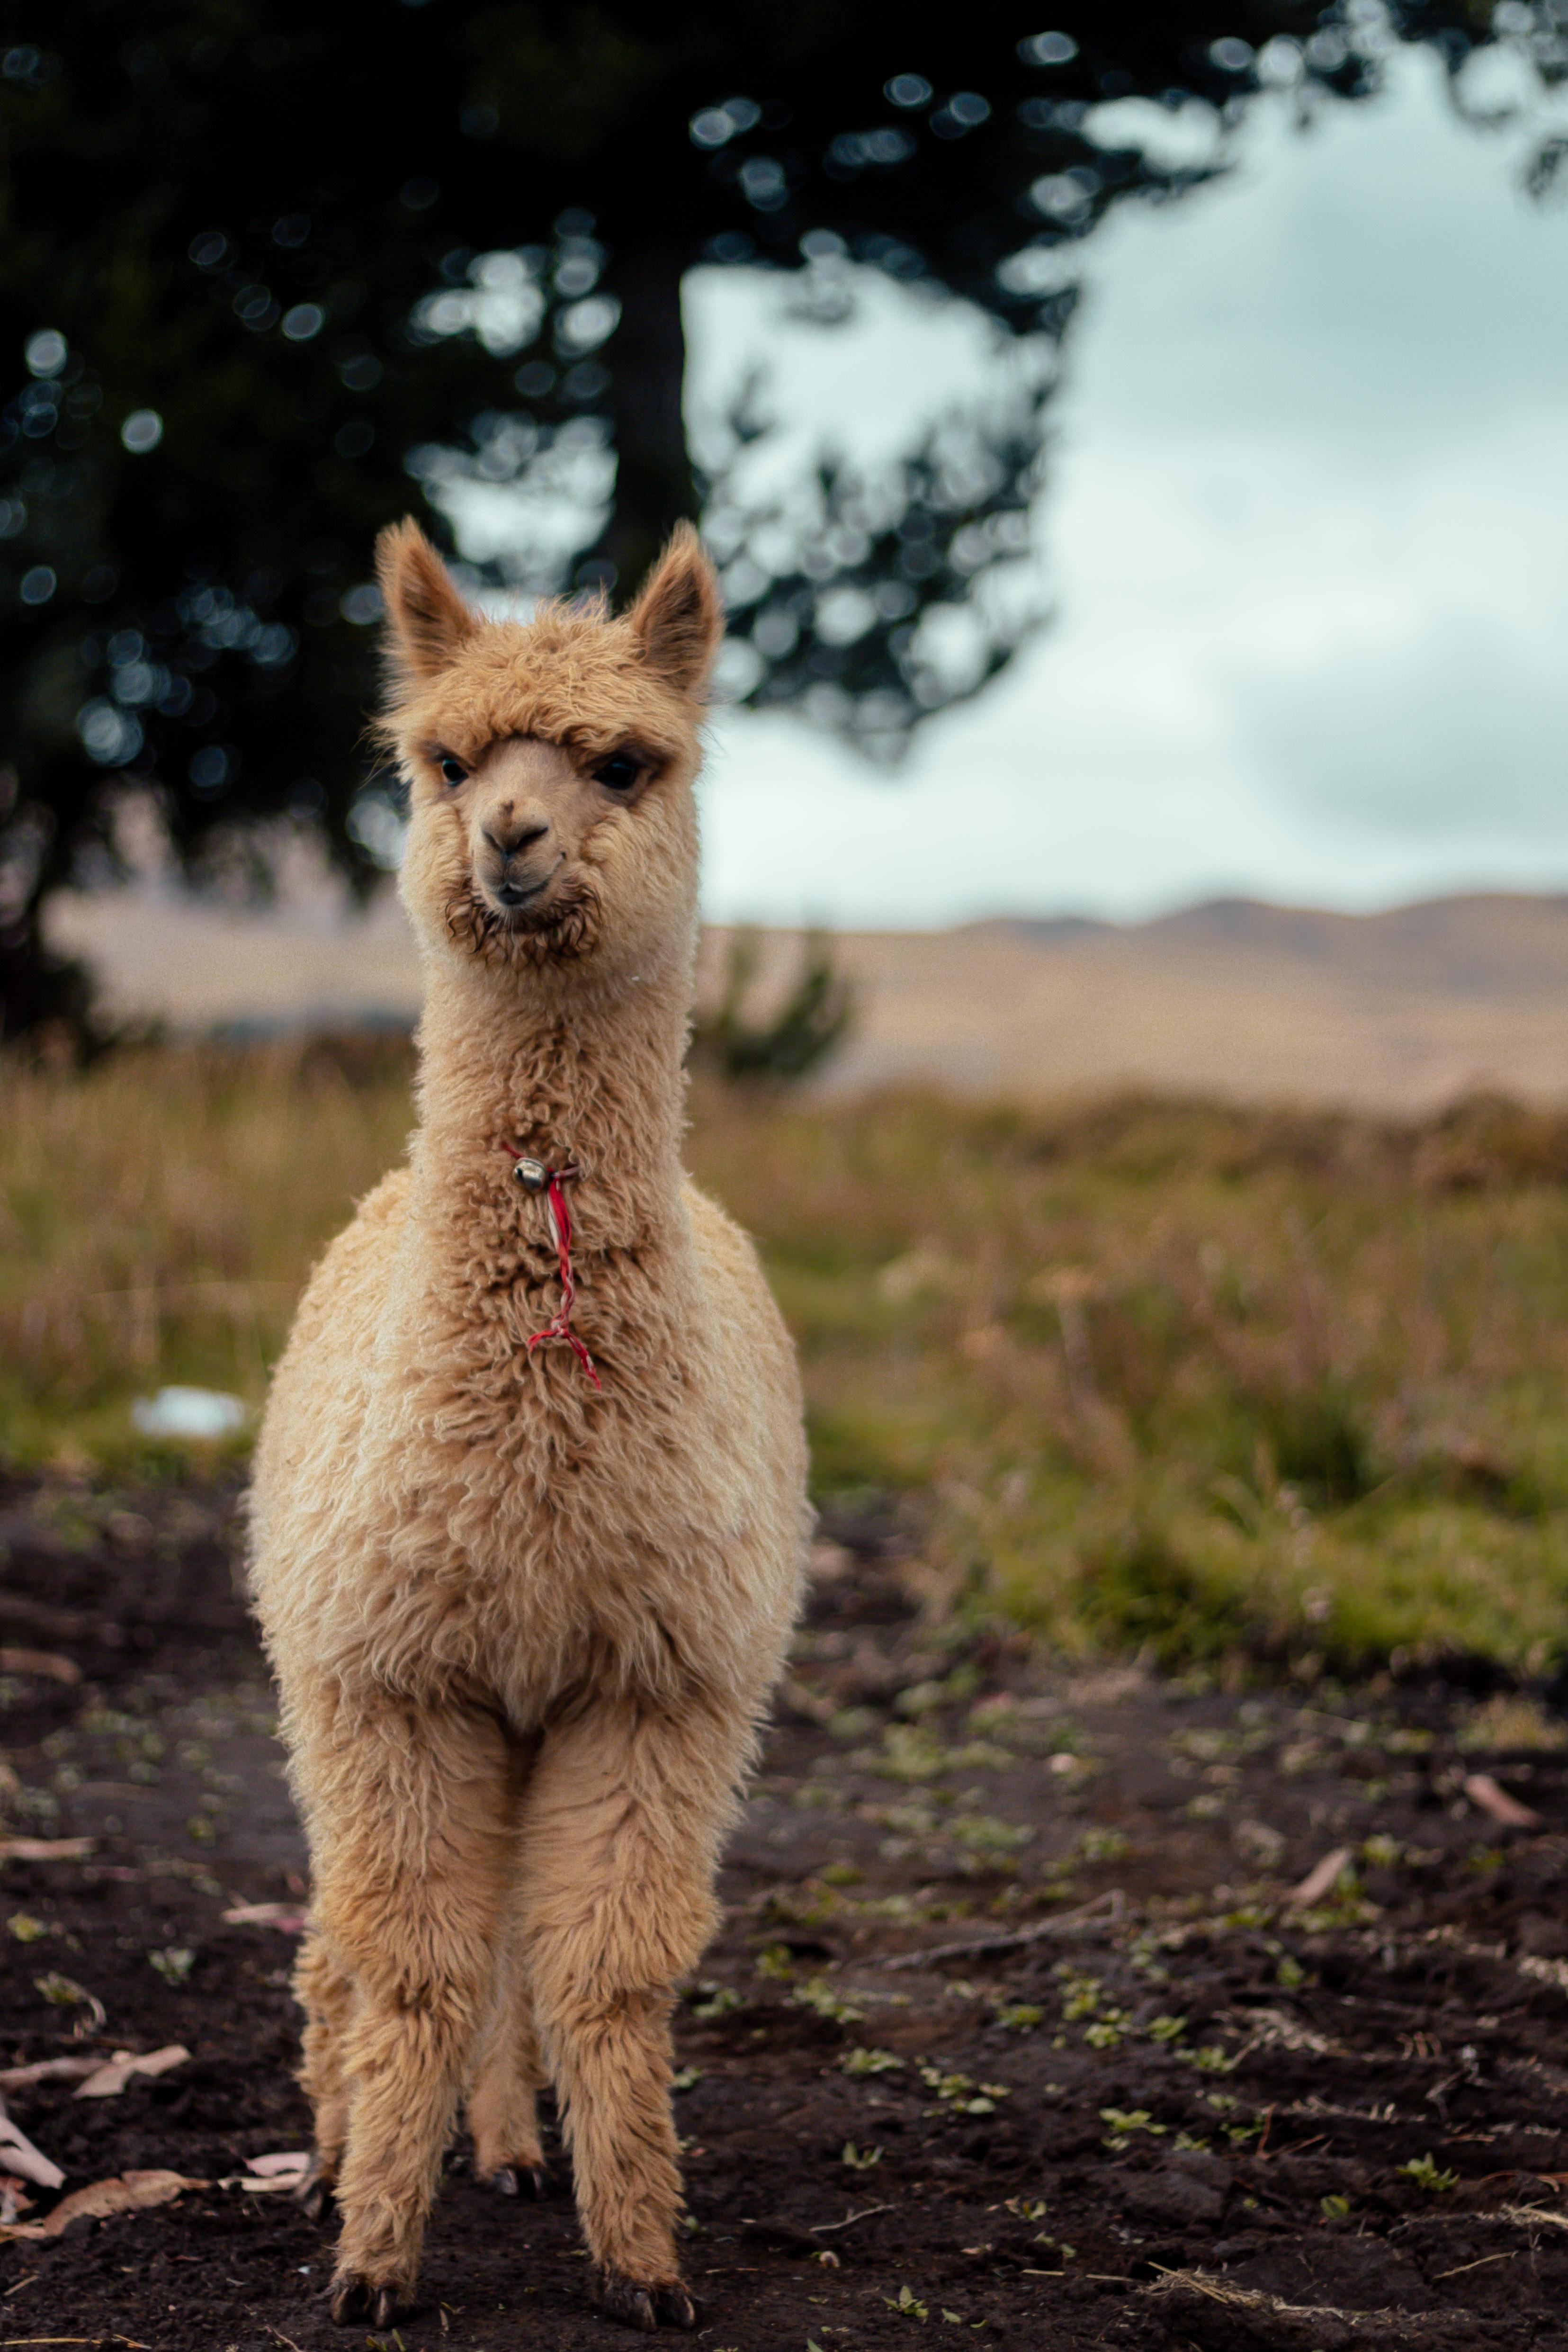 lama standing on brown soil